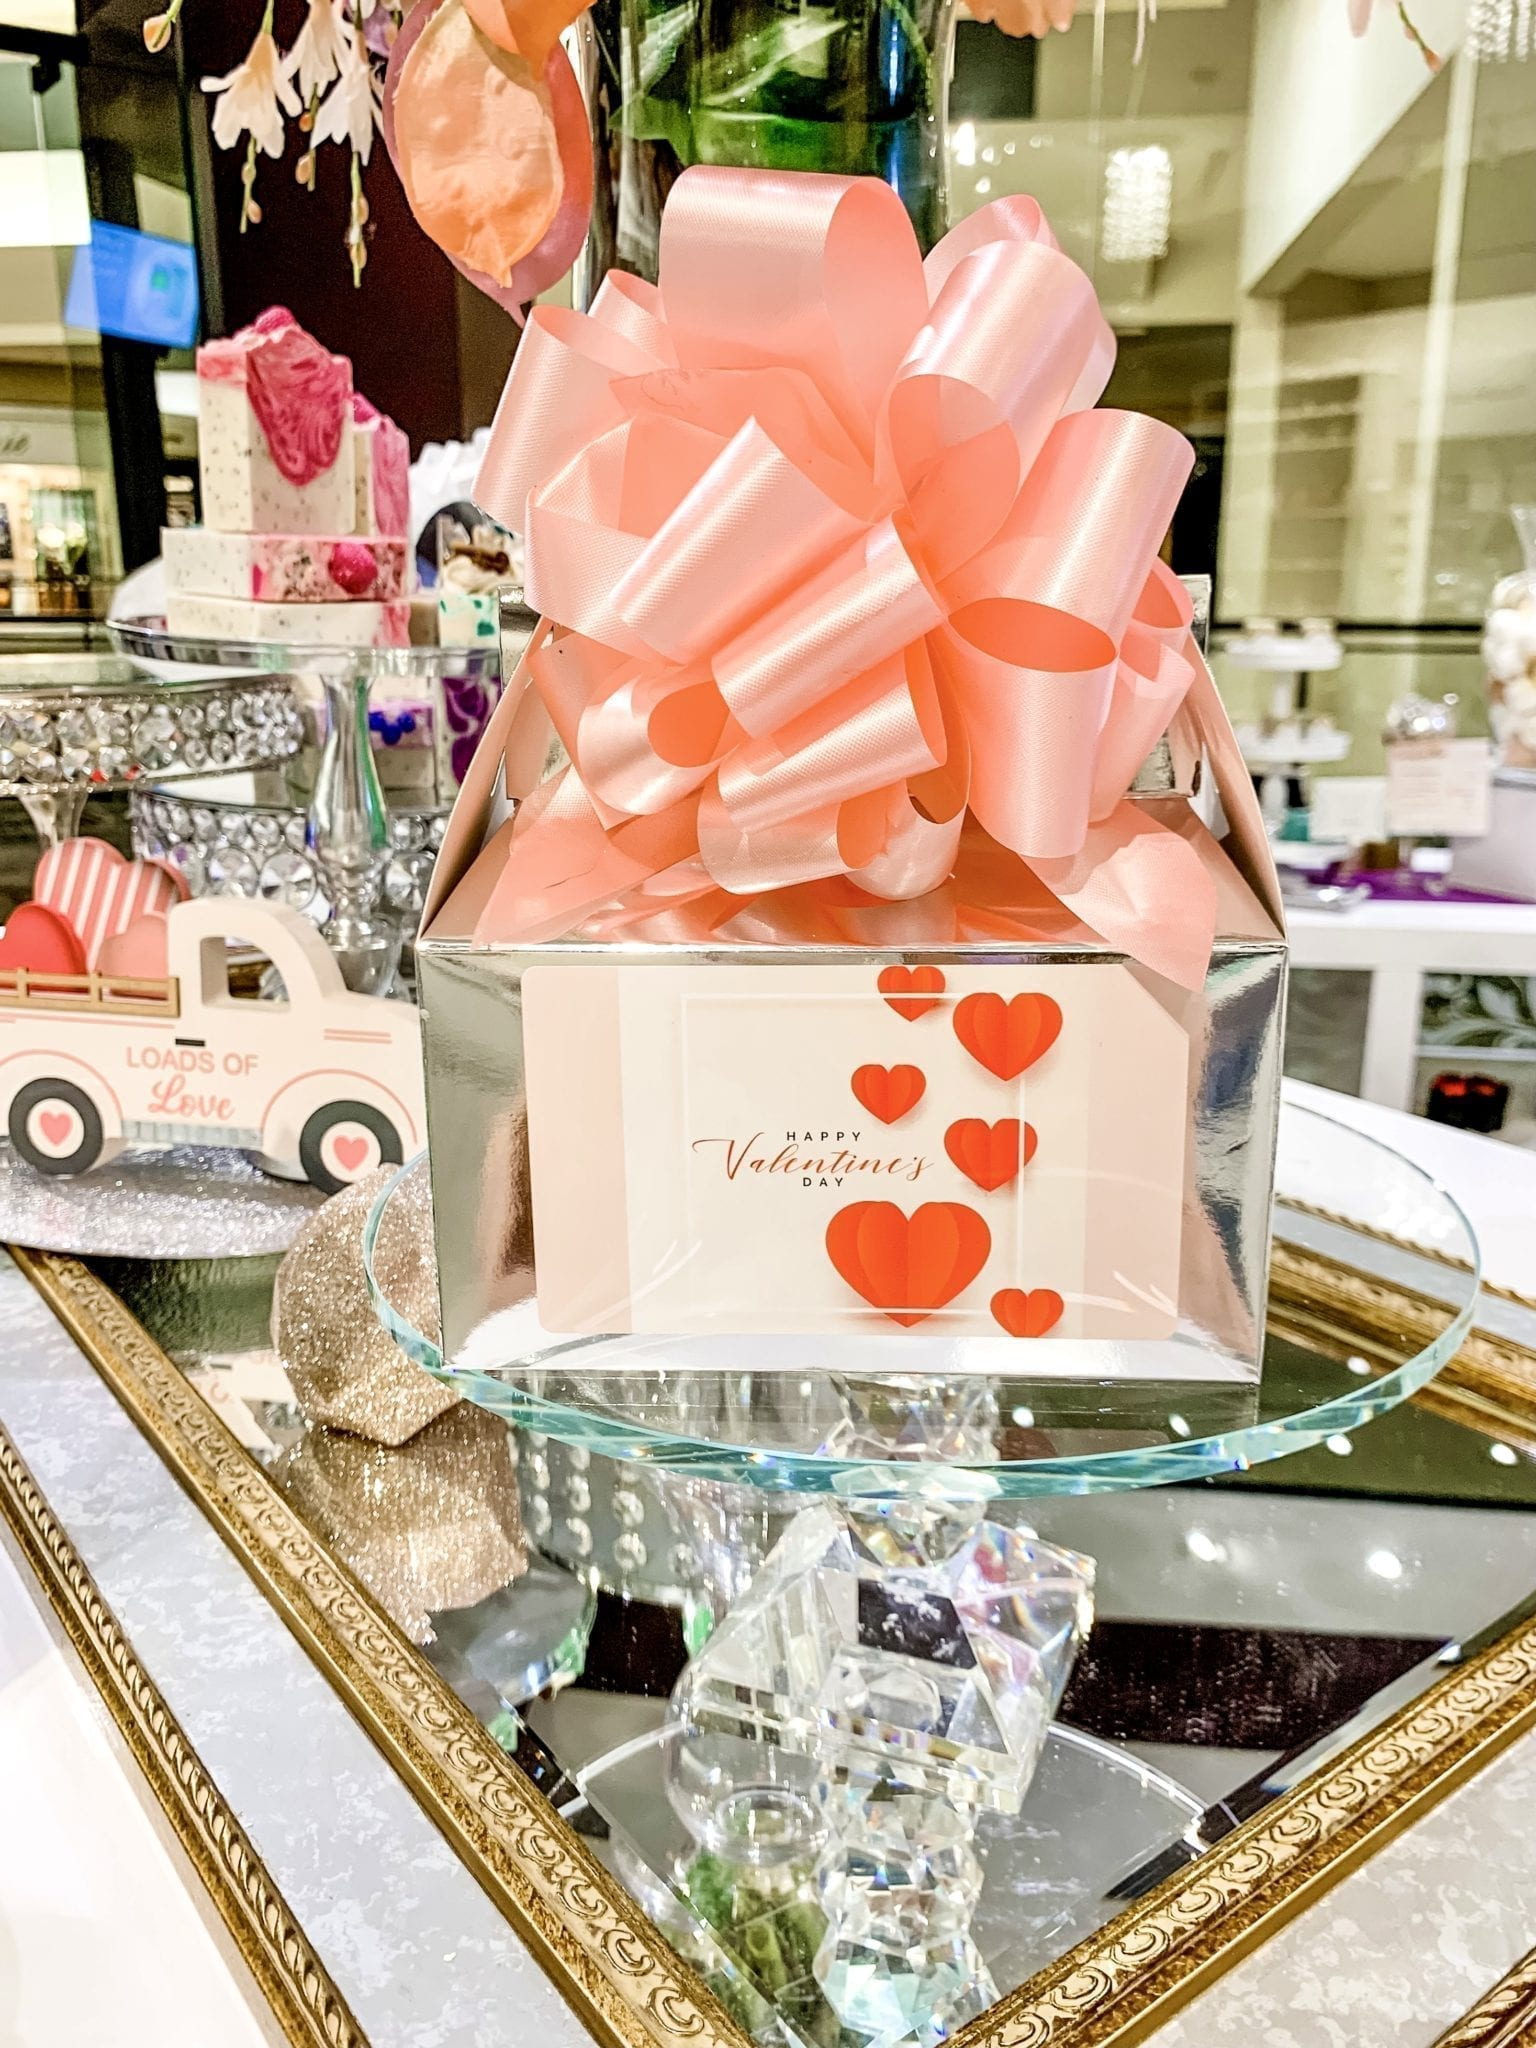 Be Mine Valentine's Day Gift Box